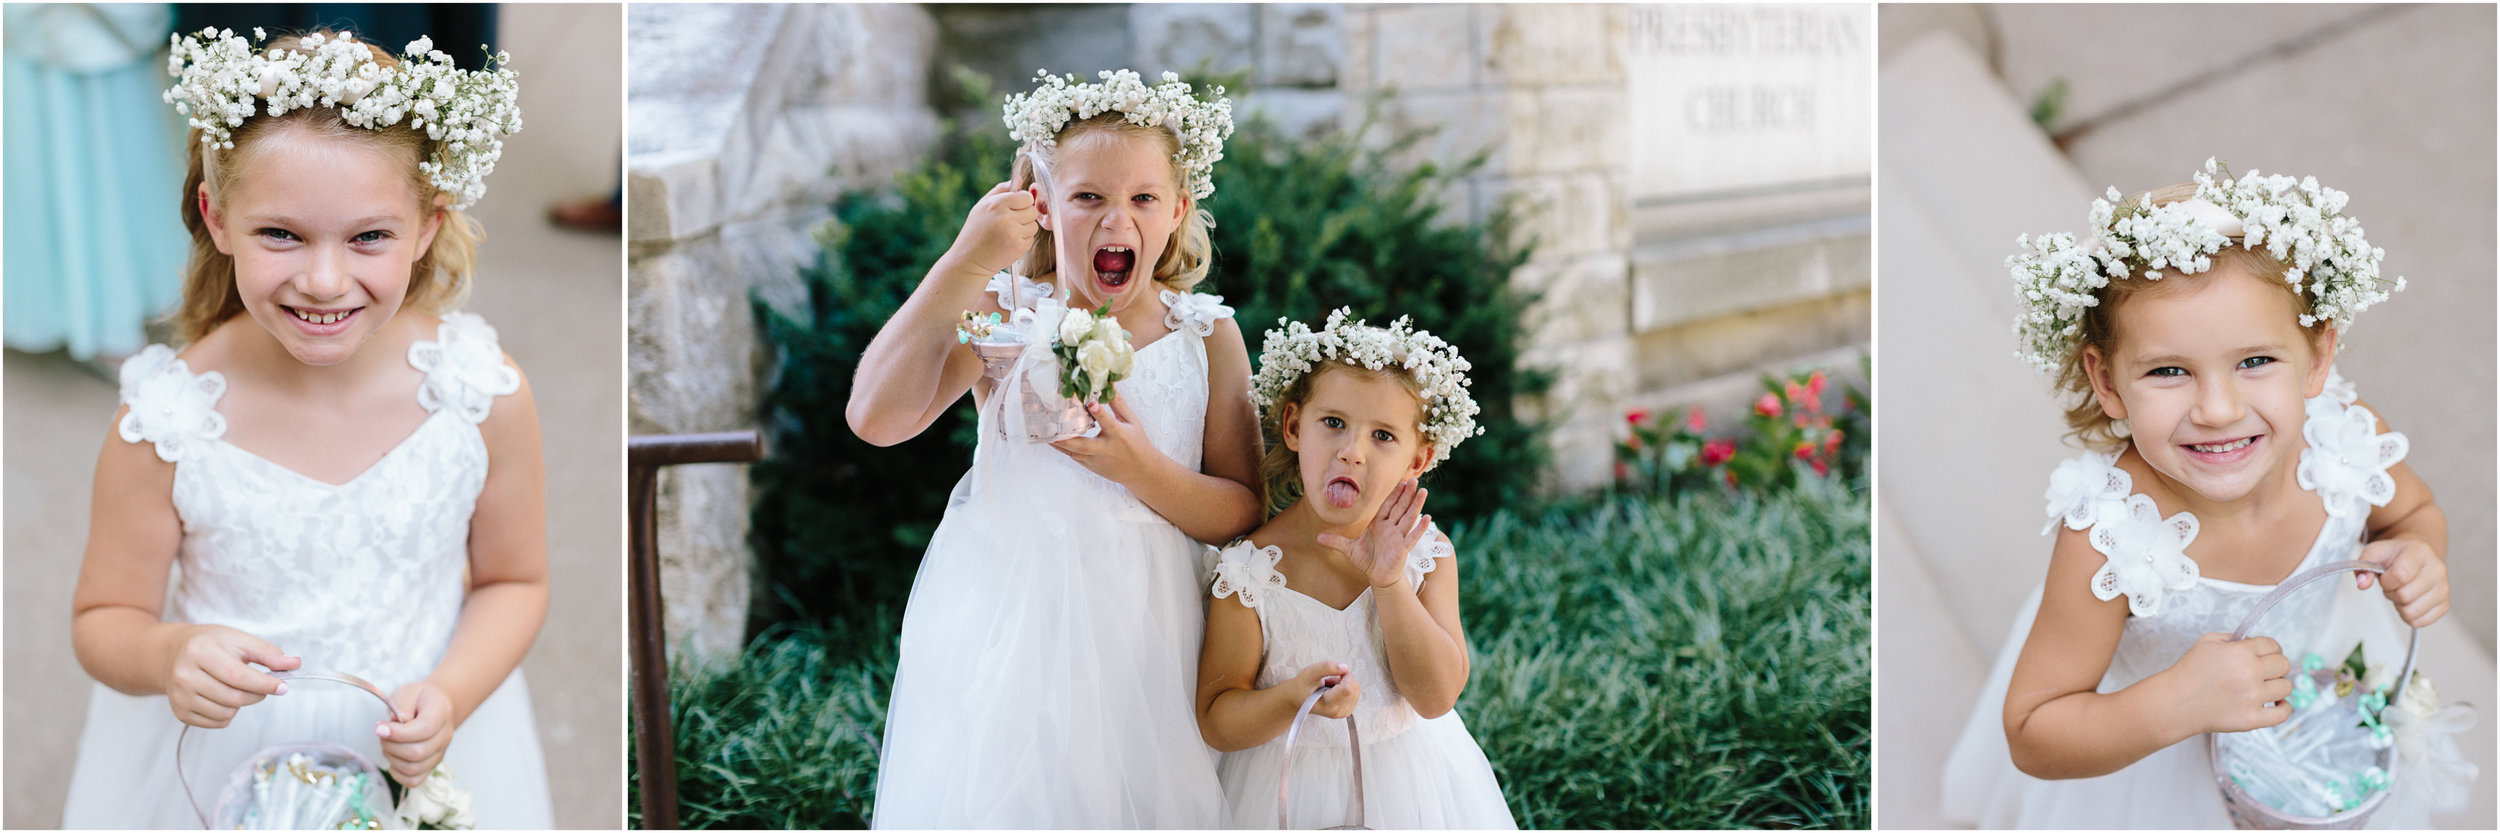 alyssa barletter photography manhattan kansas wedding photos church country club gardens taylor and kirk-24.jpg